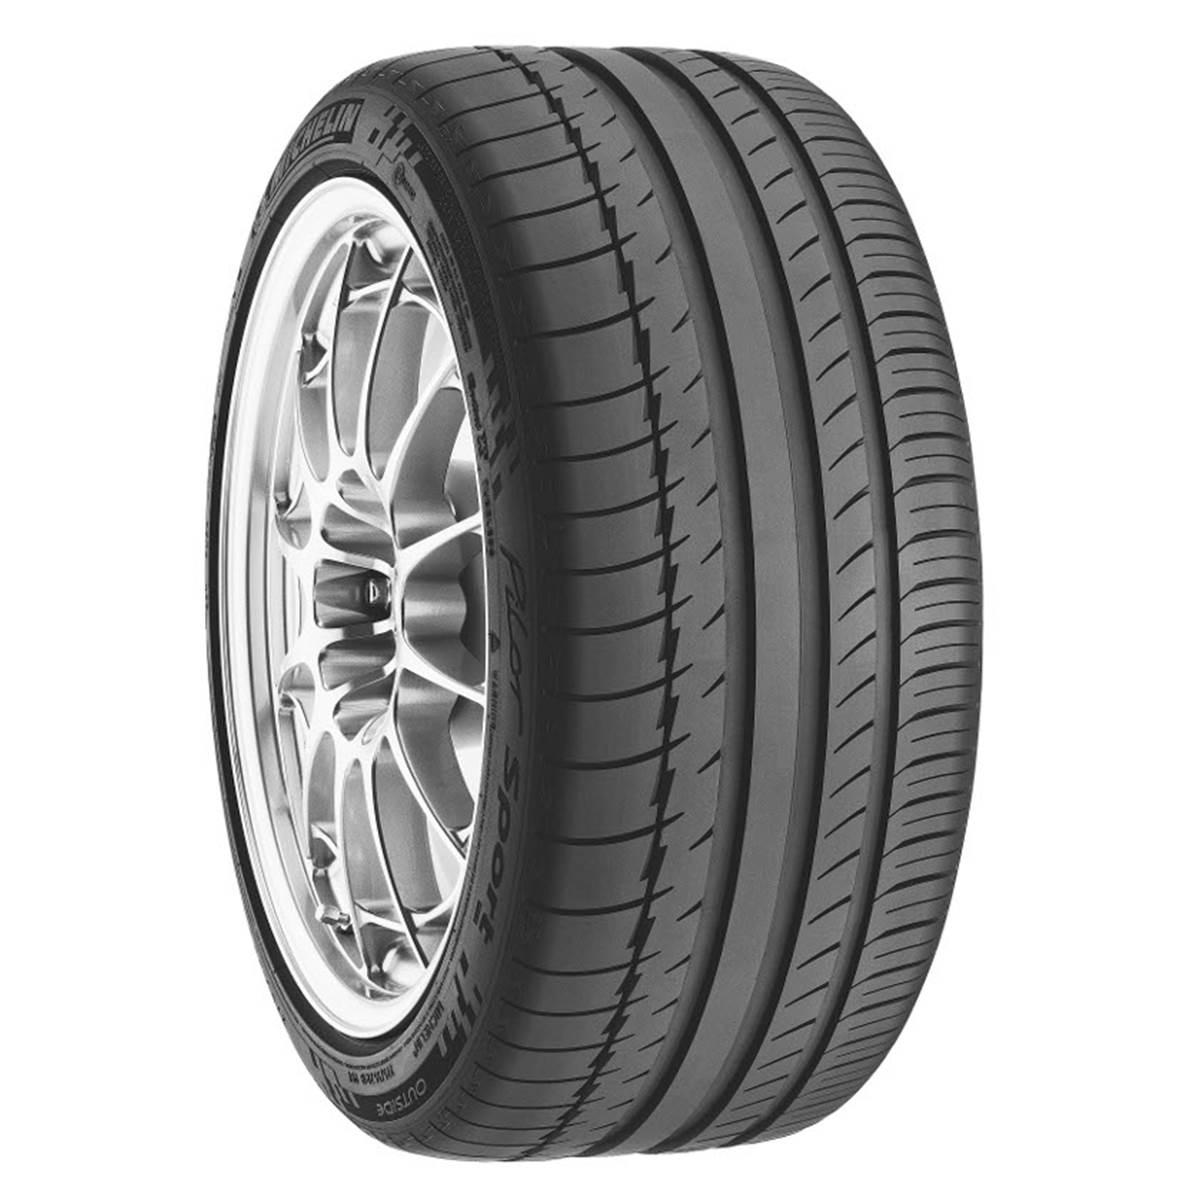 Pneu Michelin 255/40R19 96Y Pilot Sport Ps2